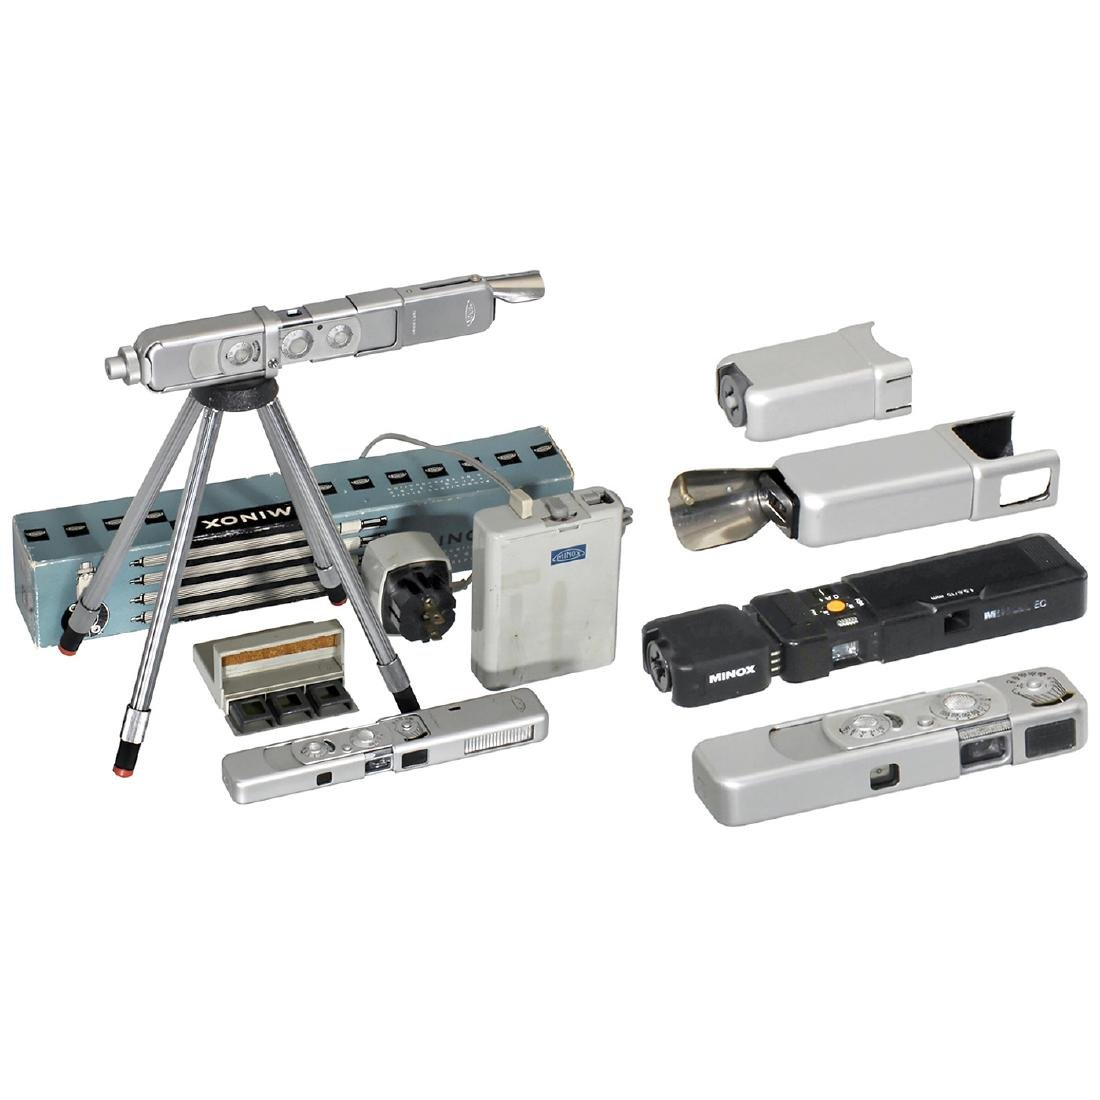 4 Minox Cameras and Accessories